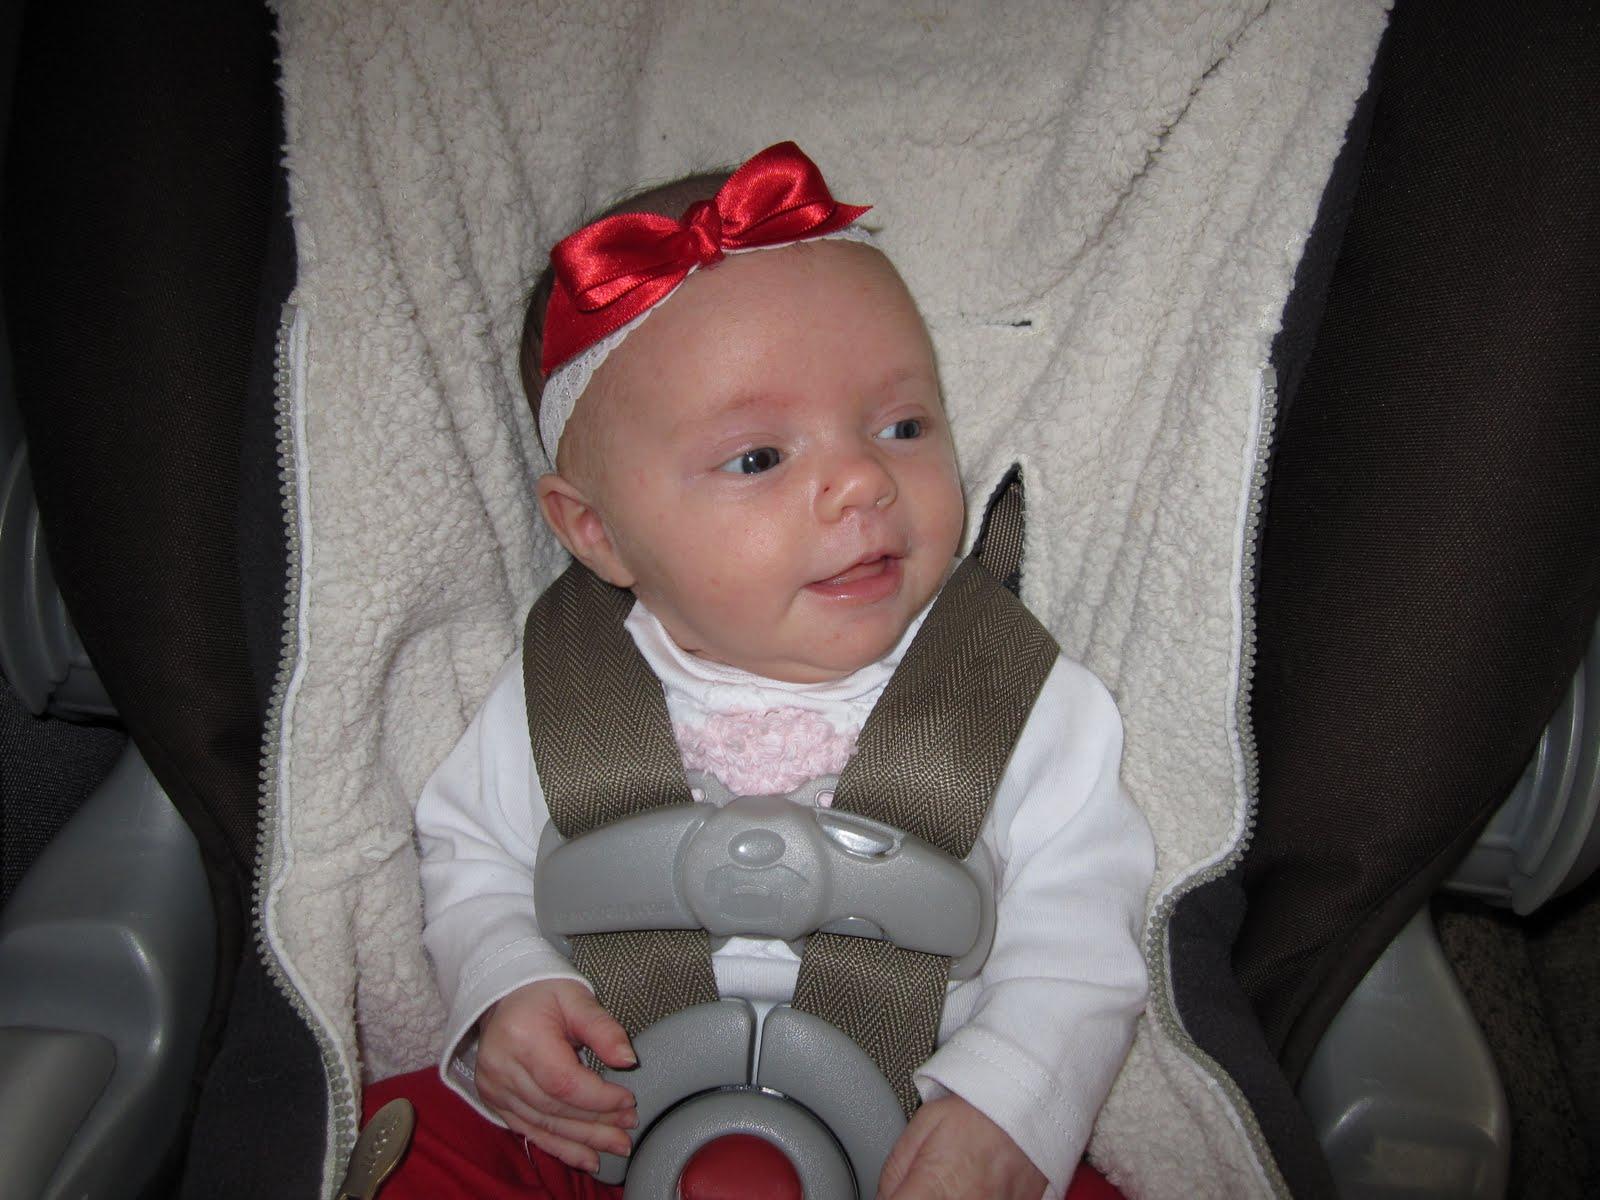 http://1.bp.blogspot.com/_cllvBlA7iZ0/TQ6V-BbESWI/AAAAAAAABXk/MS6mI29JMMo/s1600/babysmiles%2B029.jpg